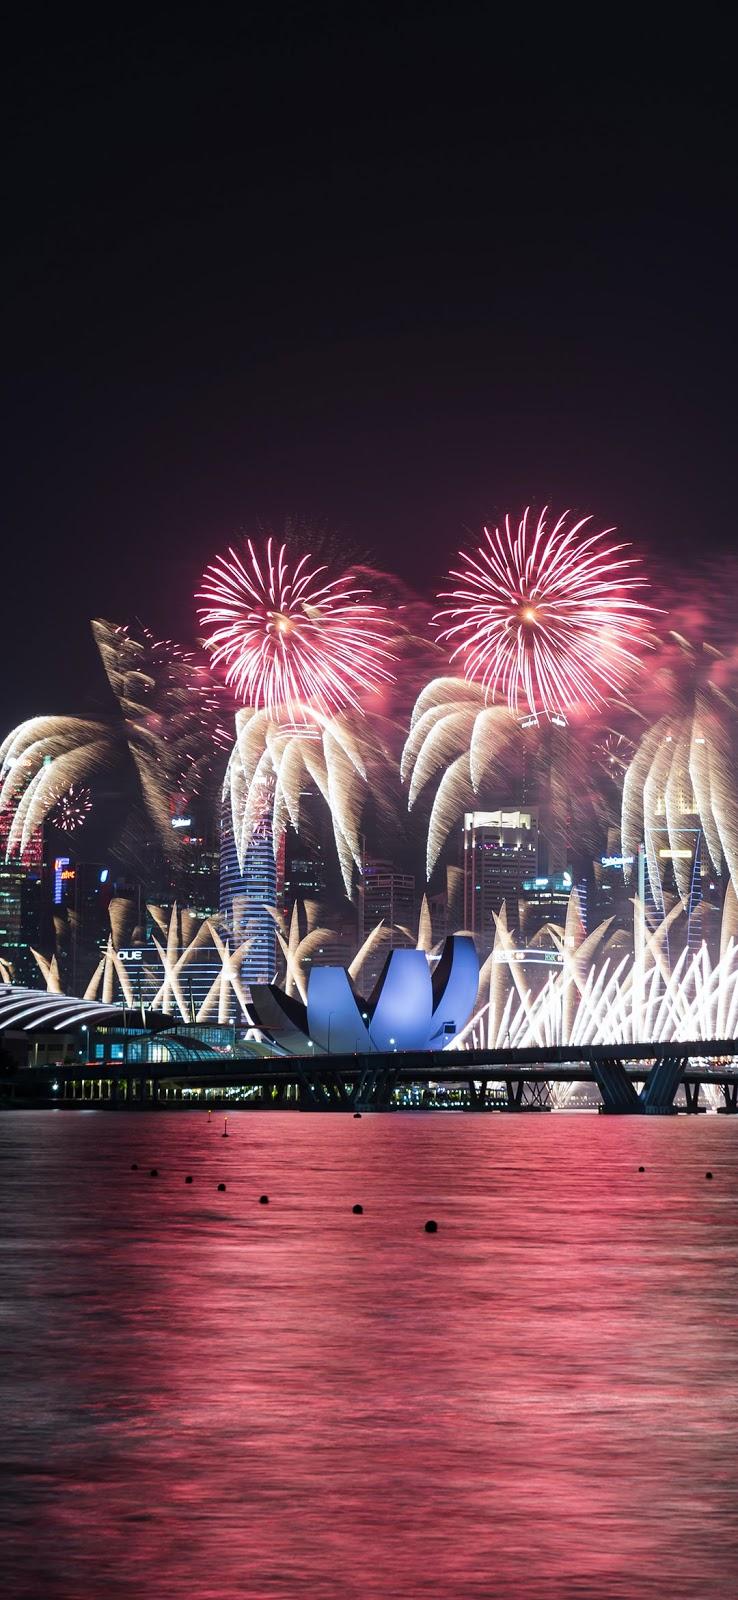 fireworks during night time wallpaper